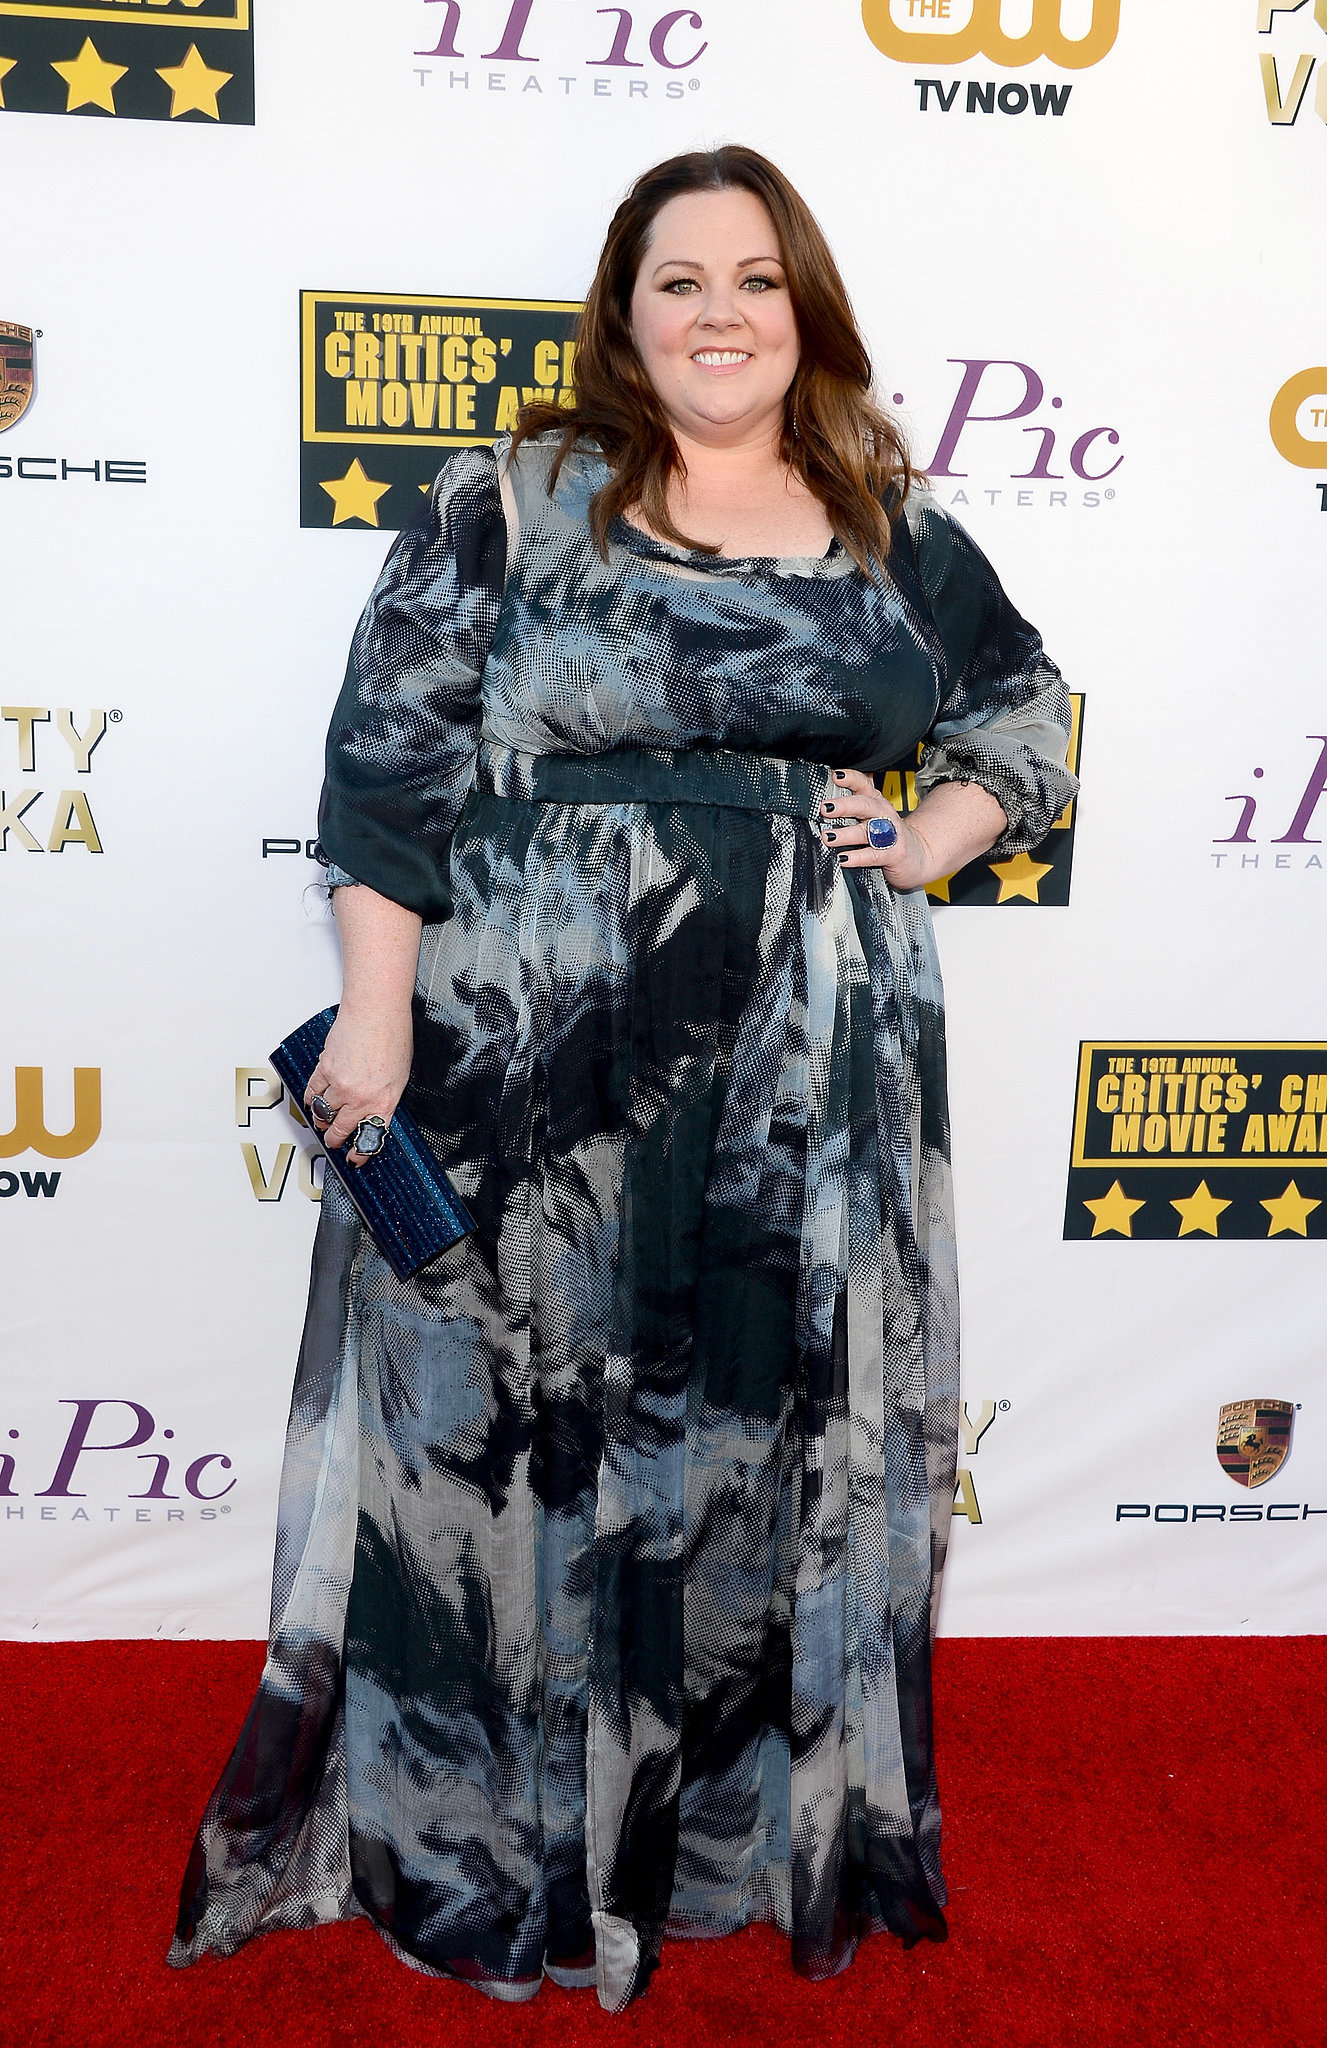 Melissa McCarthy at the Critics' Choice Awards 2014